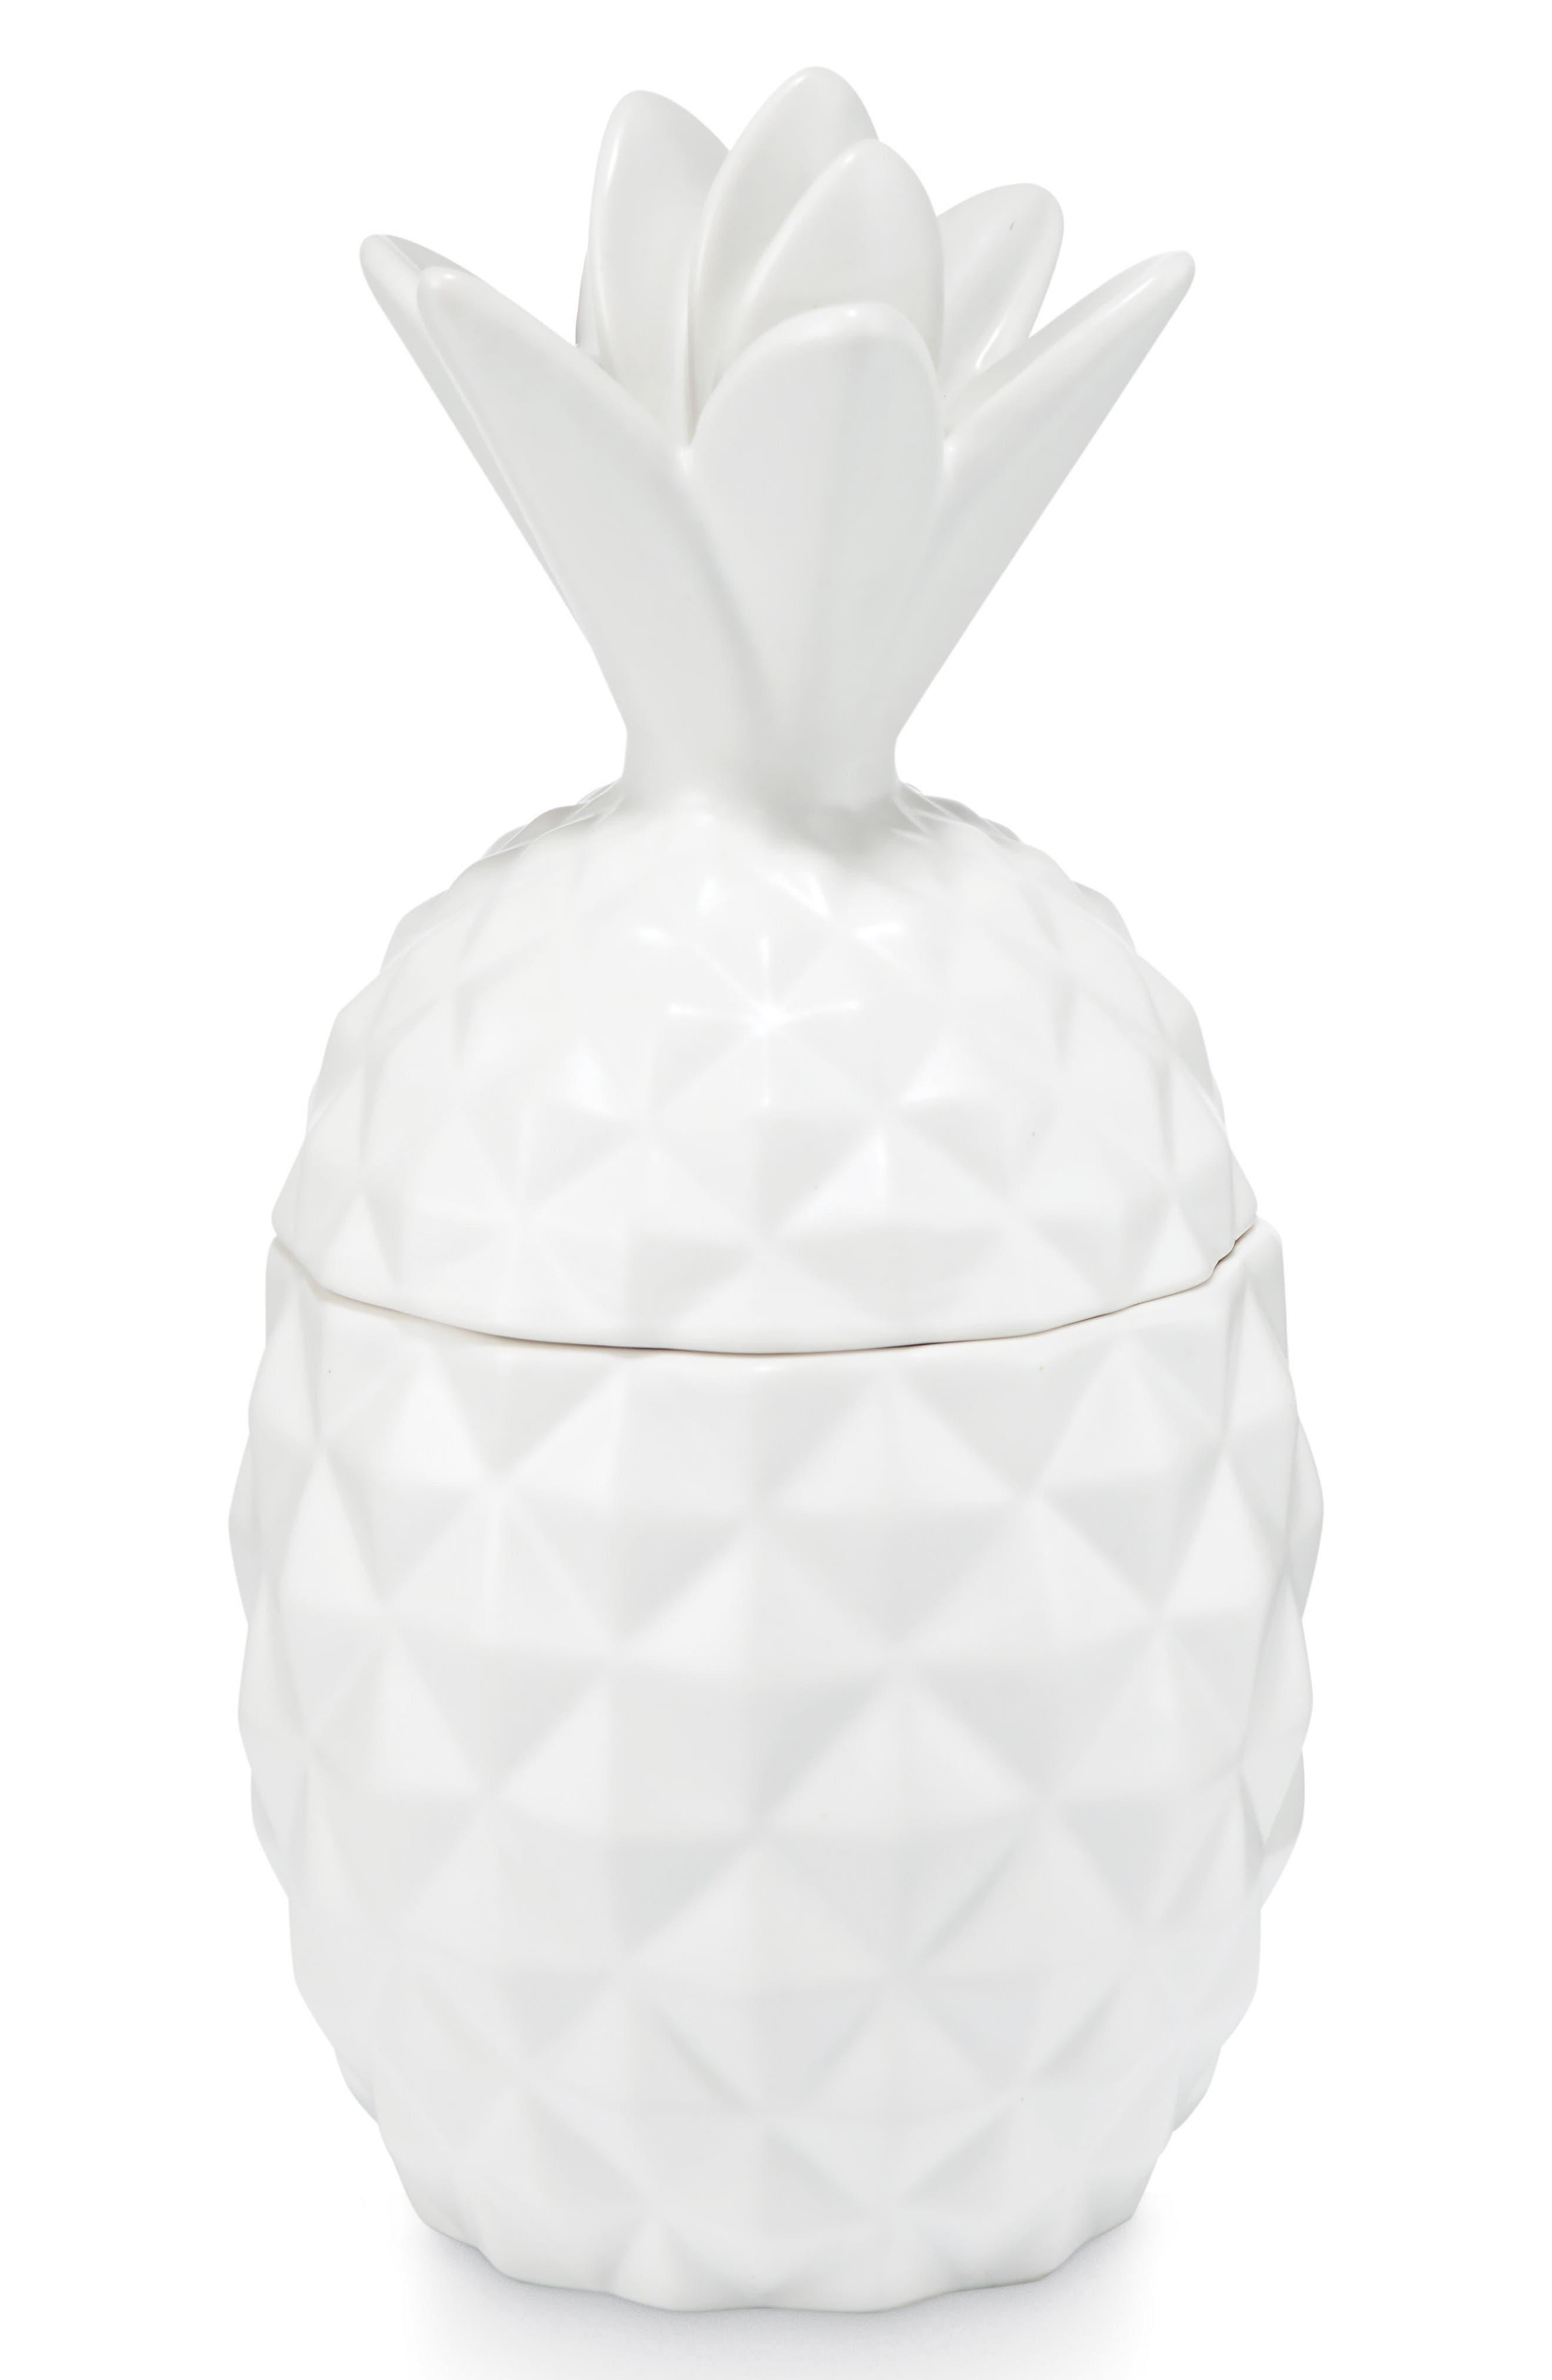 Ceramic Pineapple Jar Candle,                             Main thumbnail 1, color,                             100